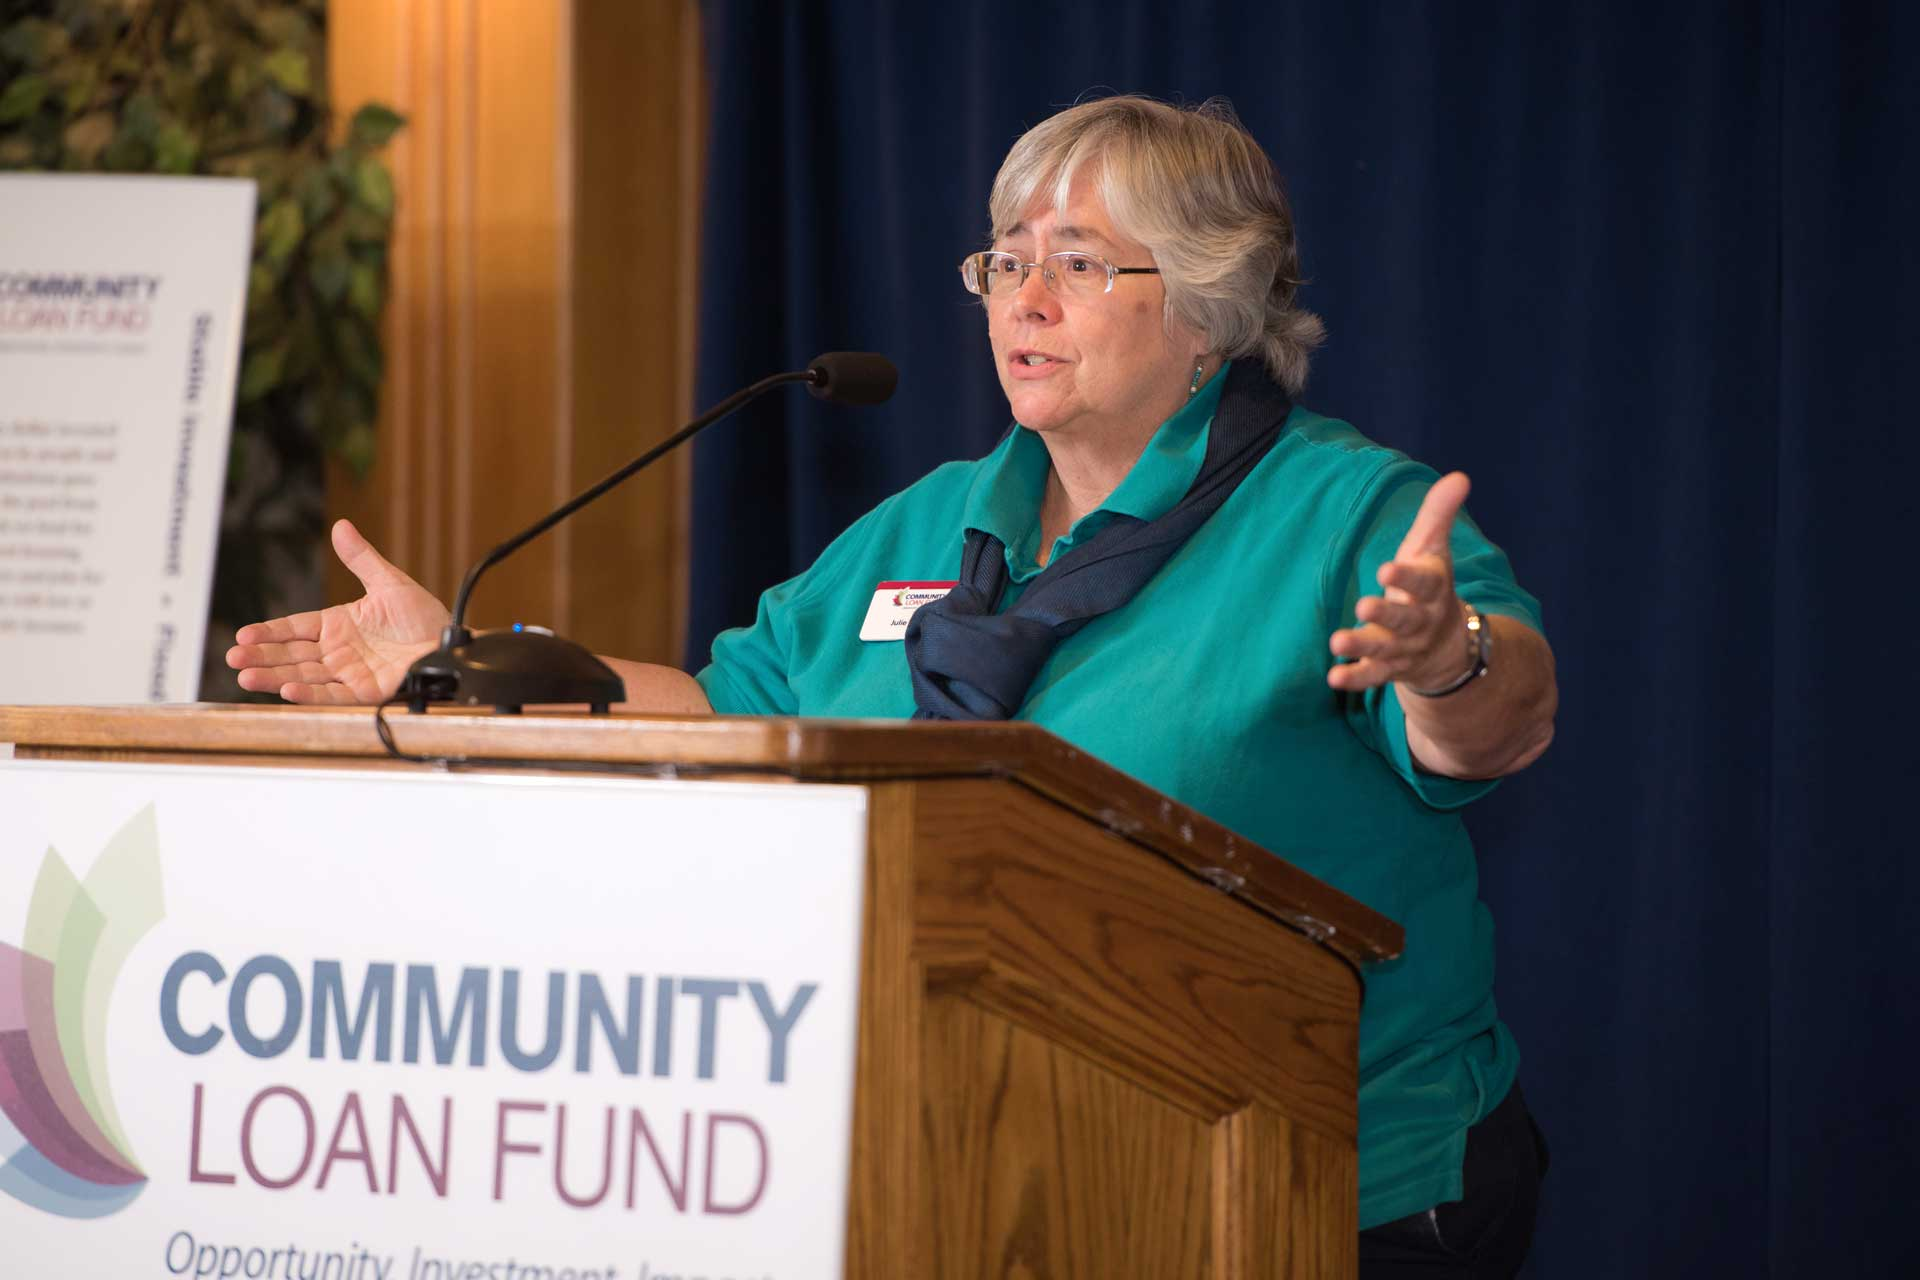 Community Loan Fund President Juliana eades speaks at podium